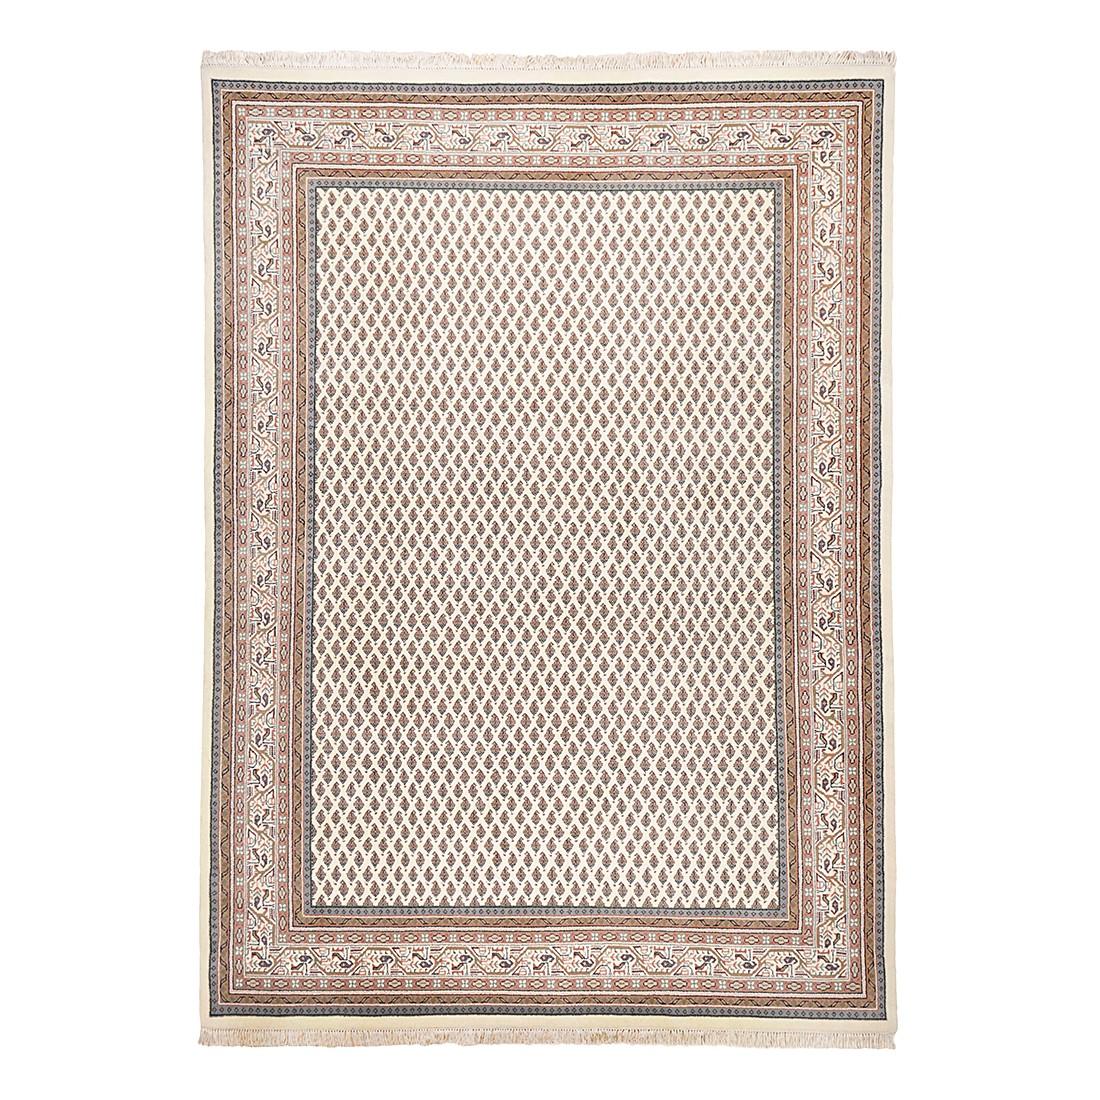 Teppich Abbas Meraj Mir - Wolle/Creme - 200 cm x 300 cm, Theko die markenteppiche